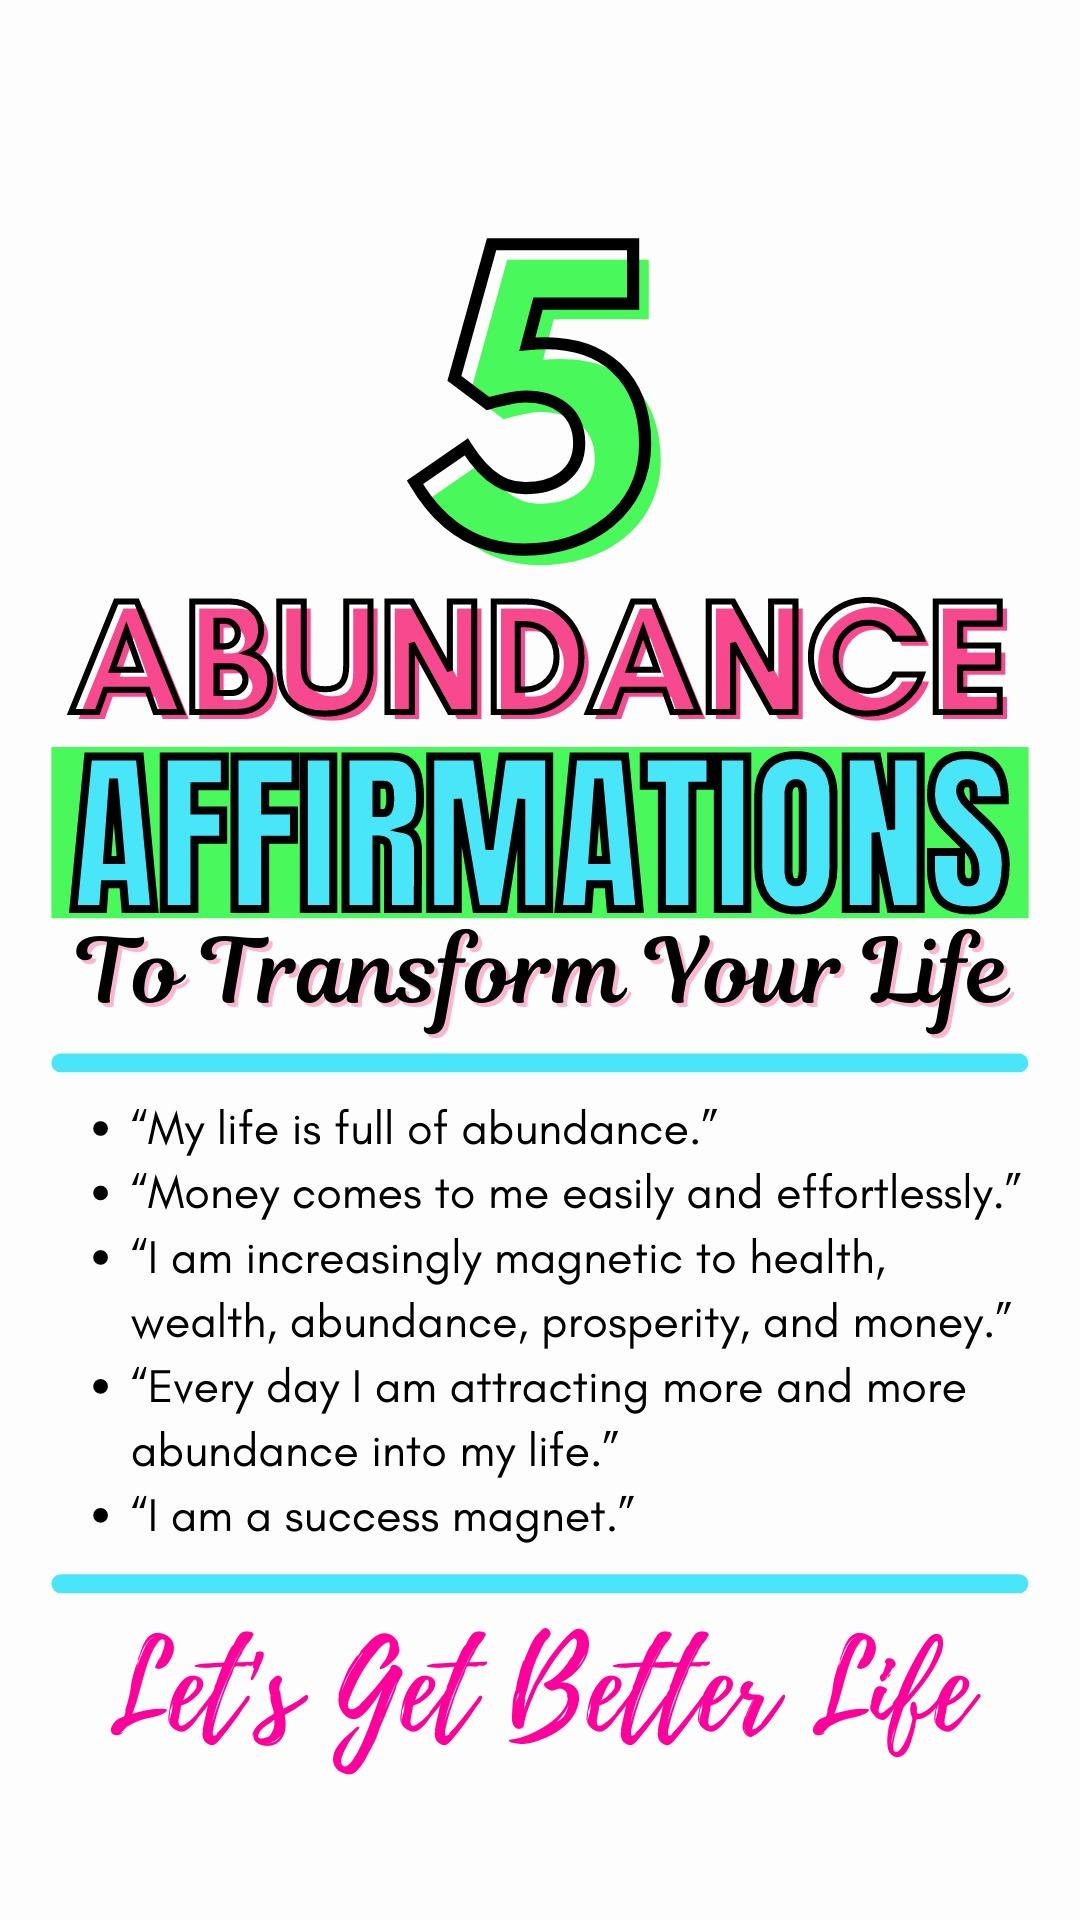 5 Abundance Affirmations To Transform Your Life